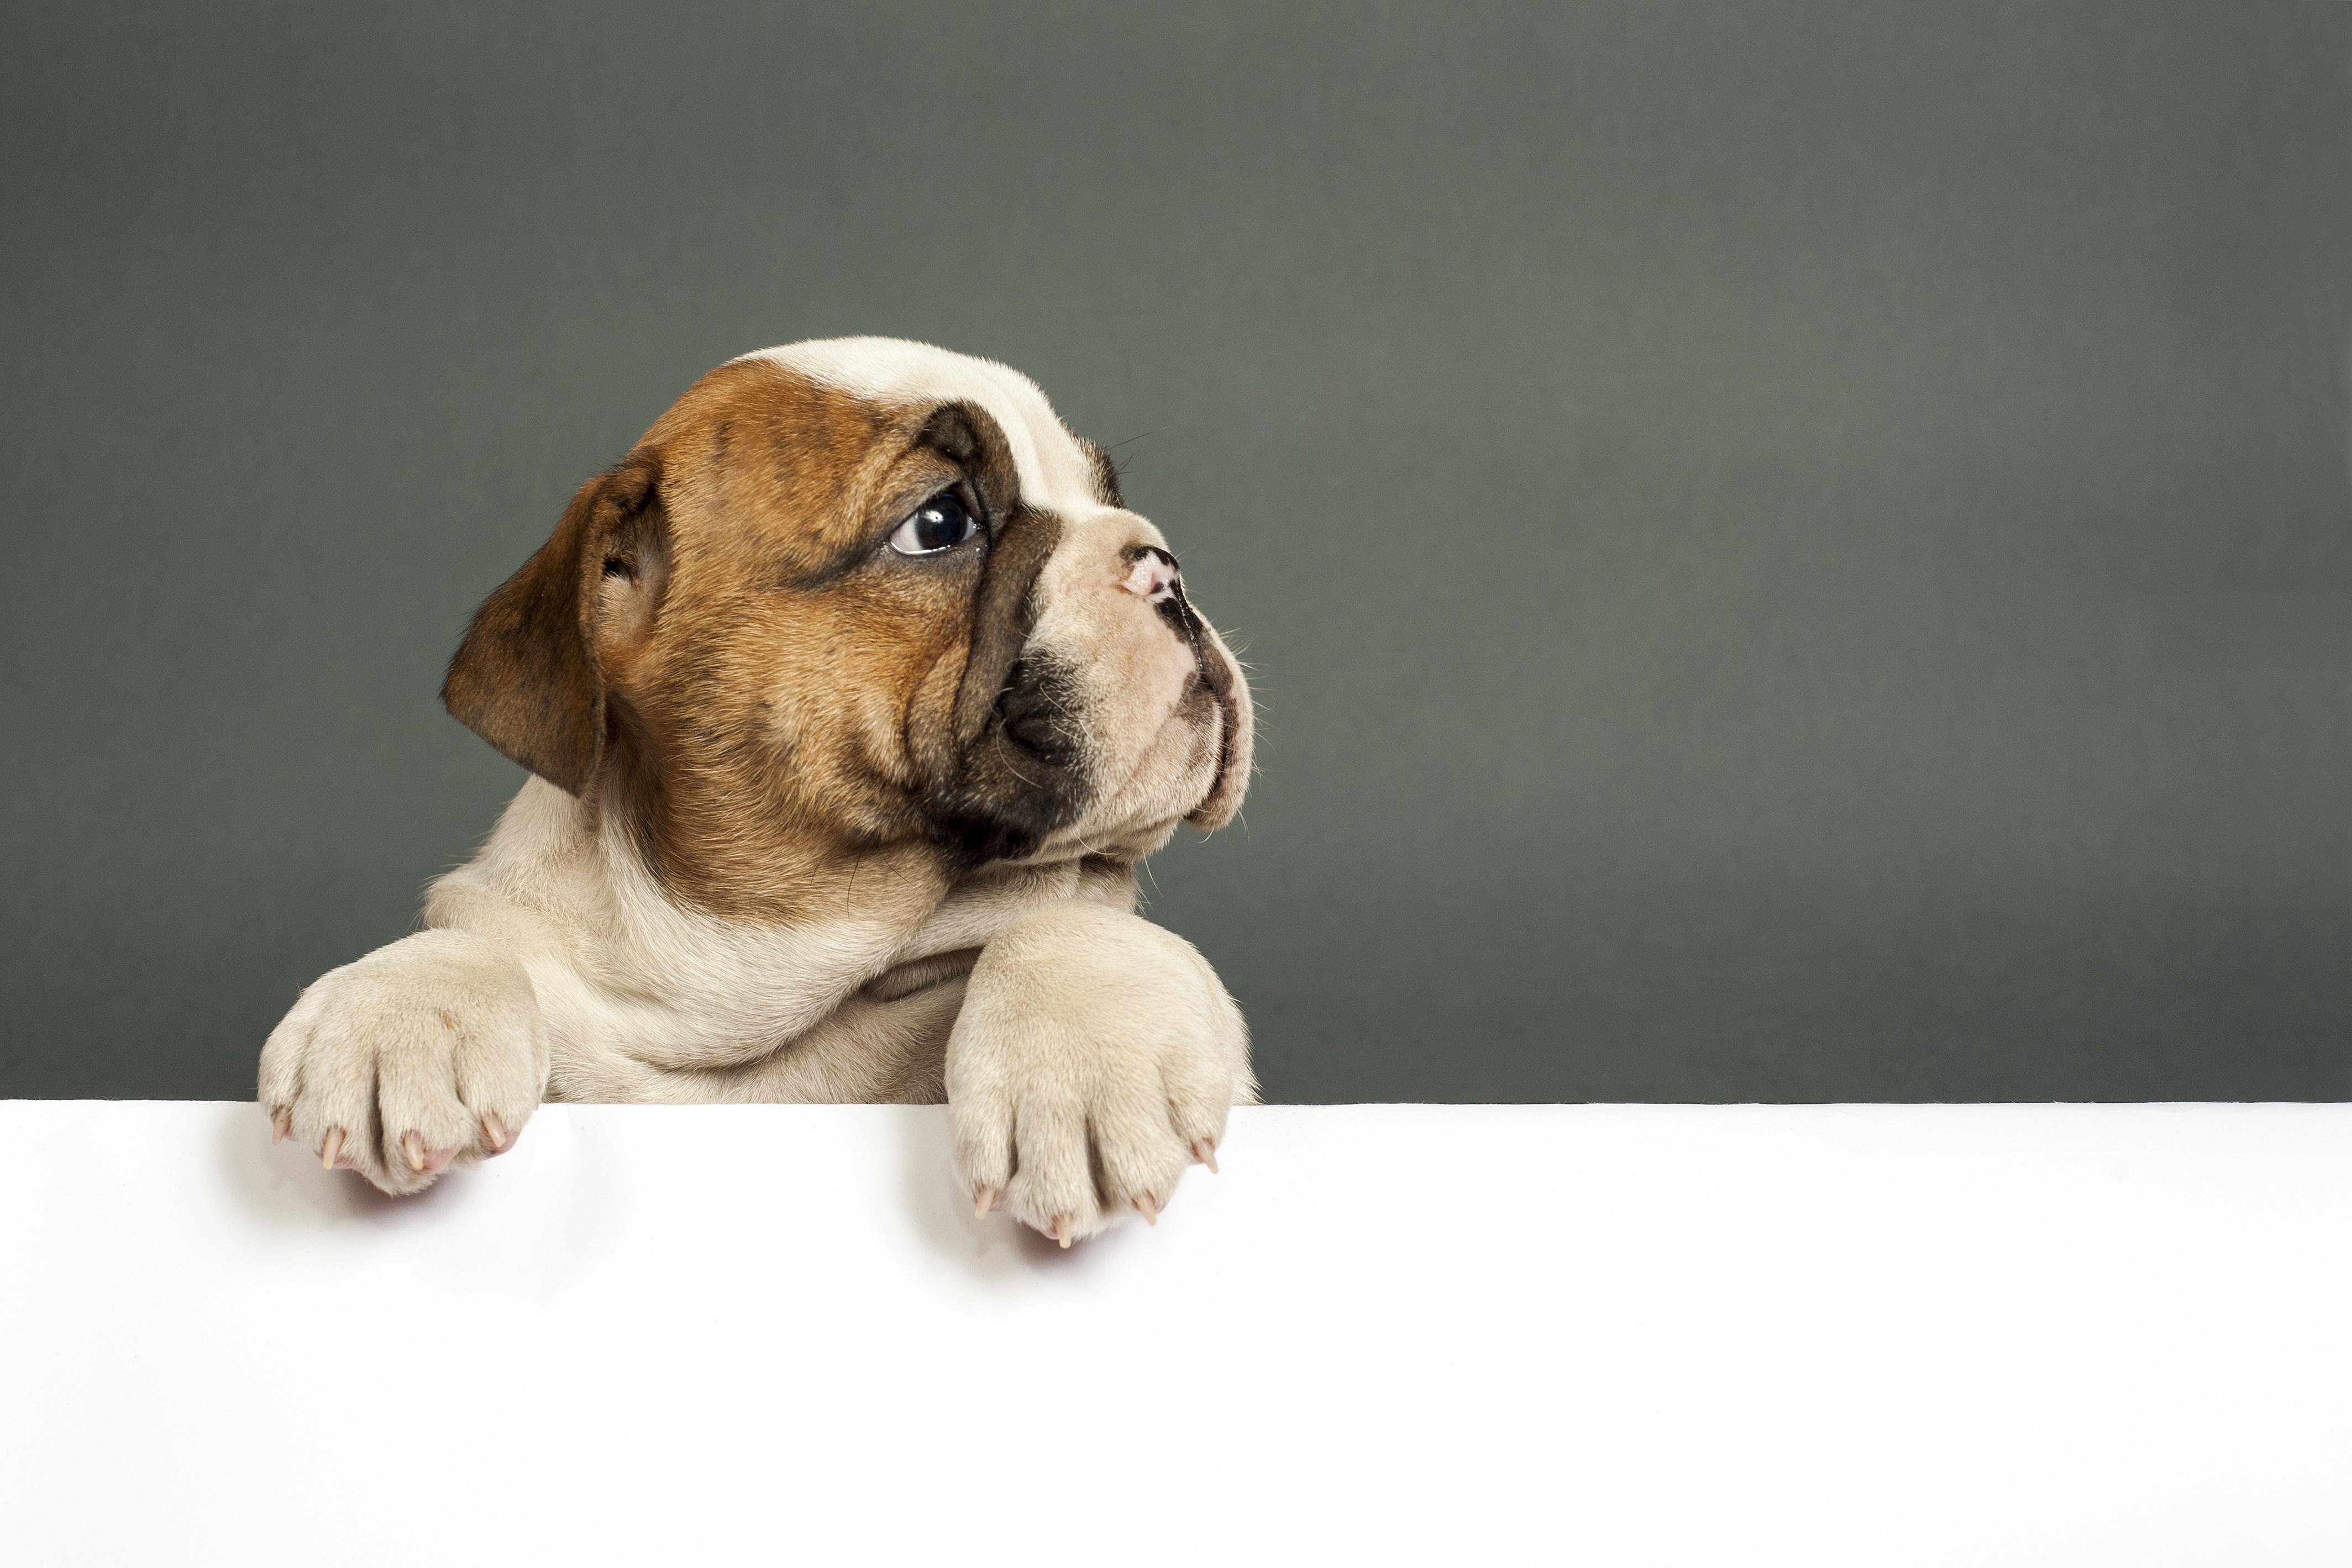 bulldog puppy 4k 1615884685 - Bulldog Puppy 4k - Bulldog Puppy 4k wallpapers